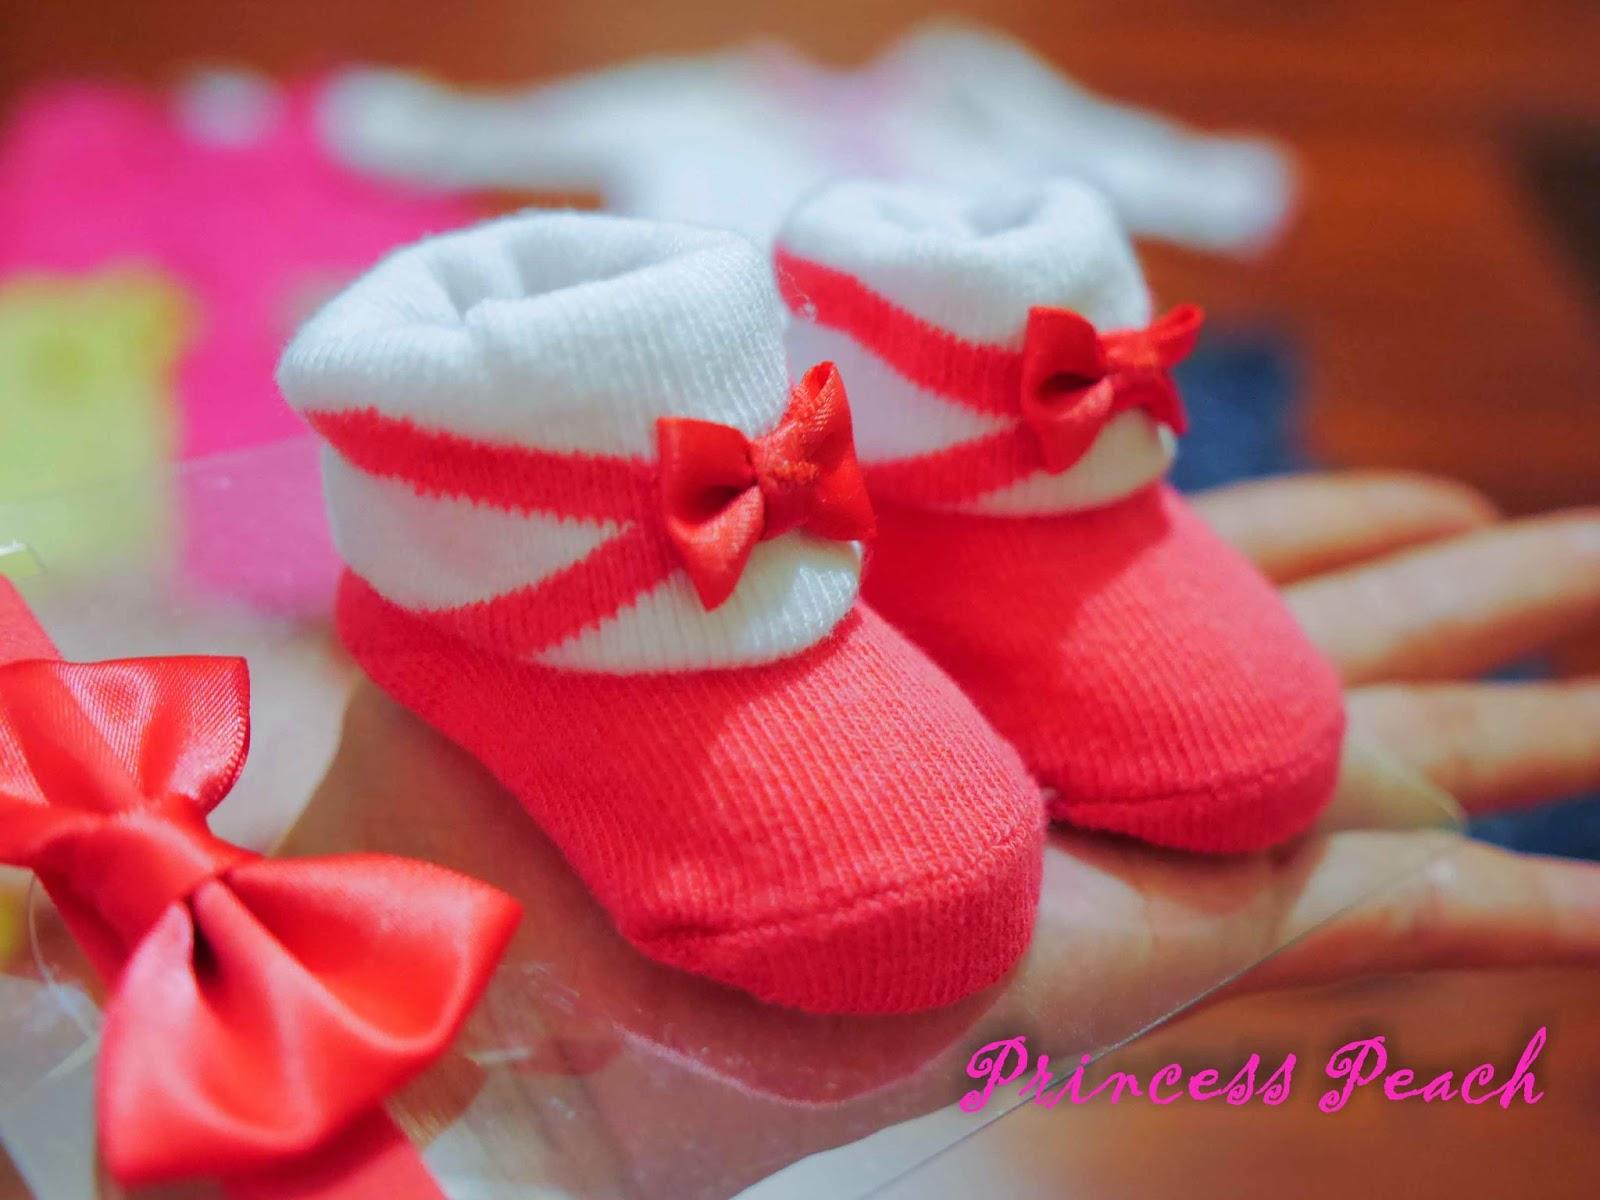 http://twpeach.blogspot.com/2014/09/pregnancy-diary9.html